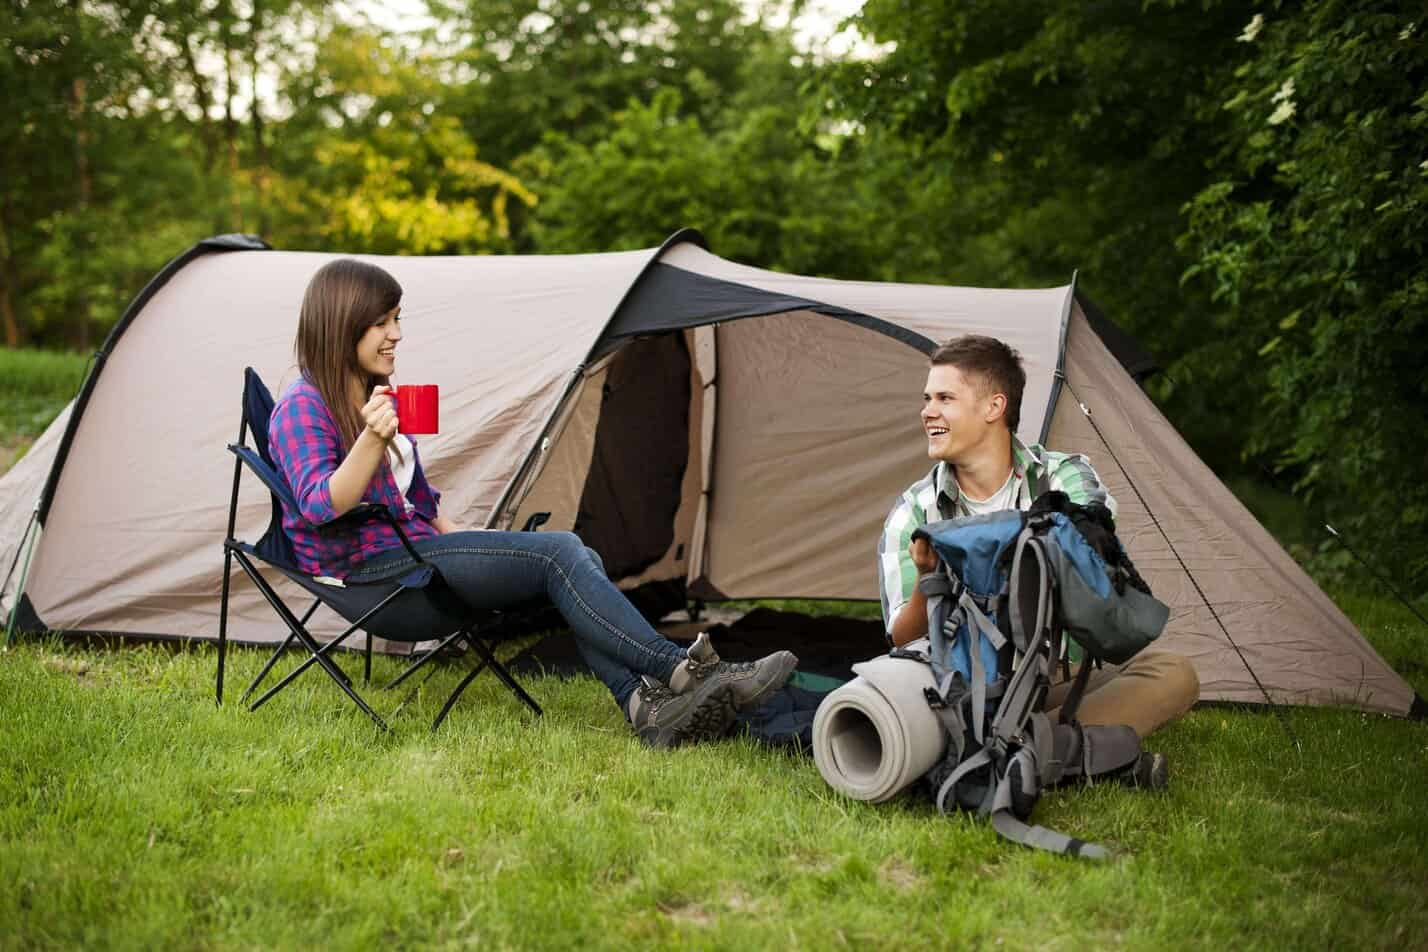 Pakkeliste til camping I telt